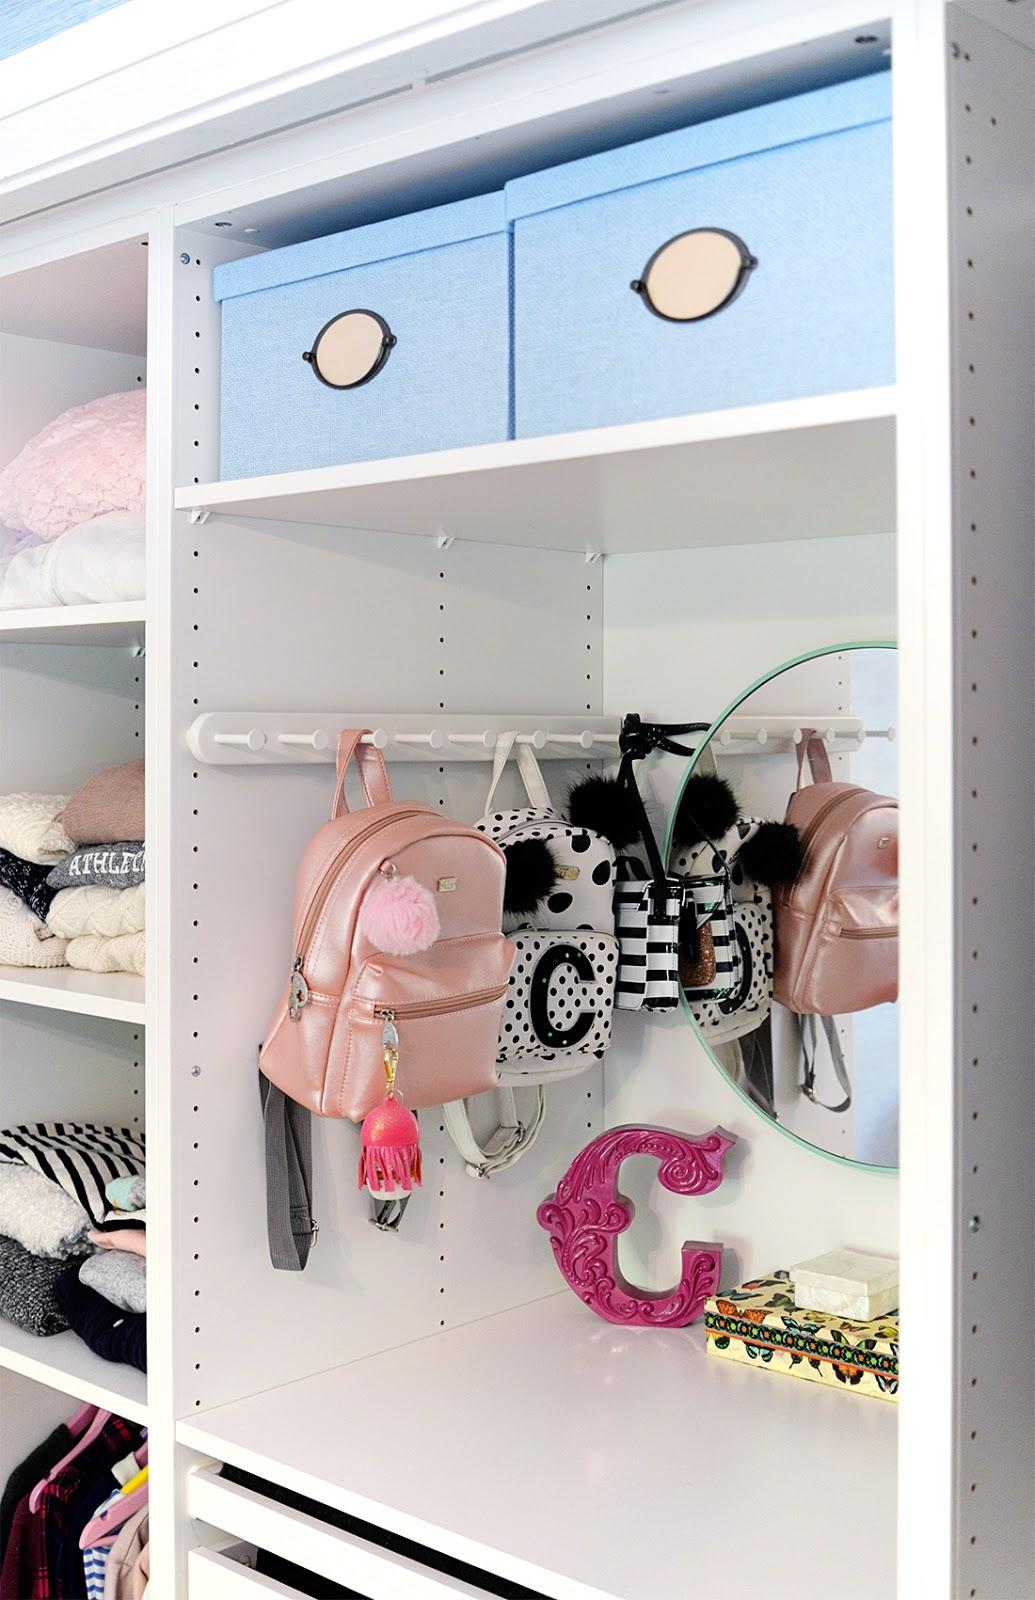 ikea closet organization ideas, kid friendly closet organization, girls closet ideas, tween closet, IKEA Pax closet